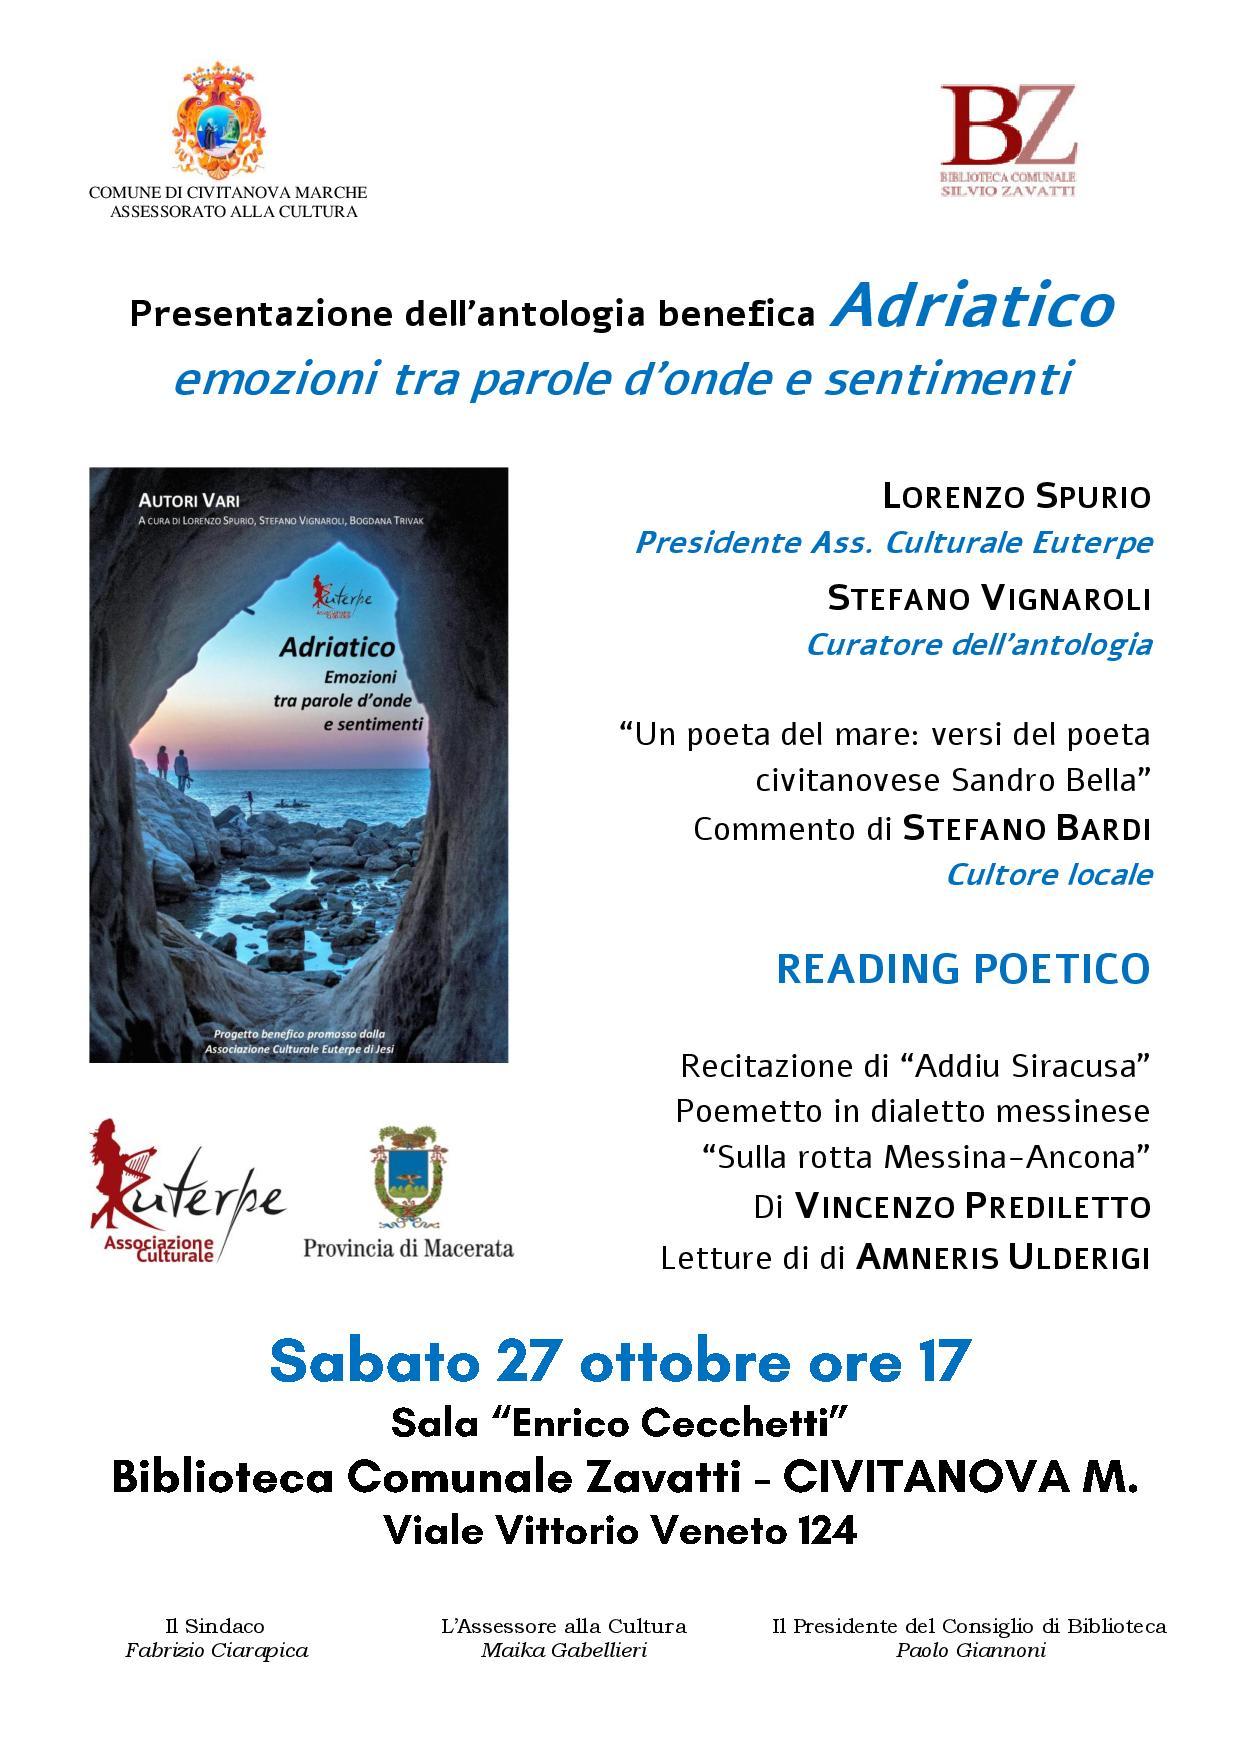 locandina 27-10-2018 civitanova marche-page-001.jpg